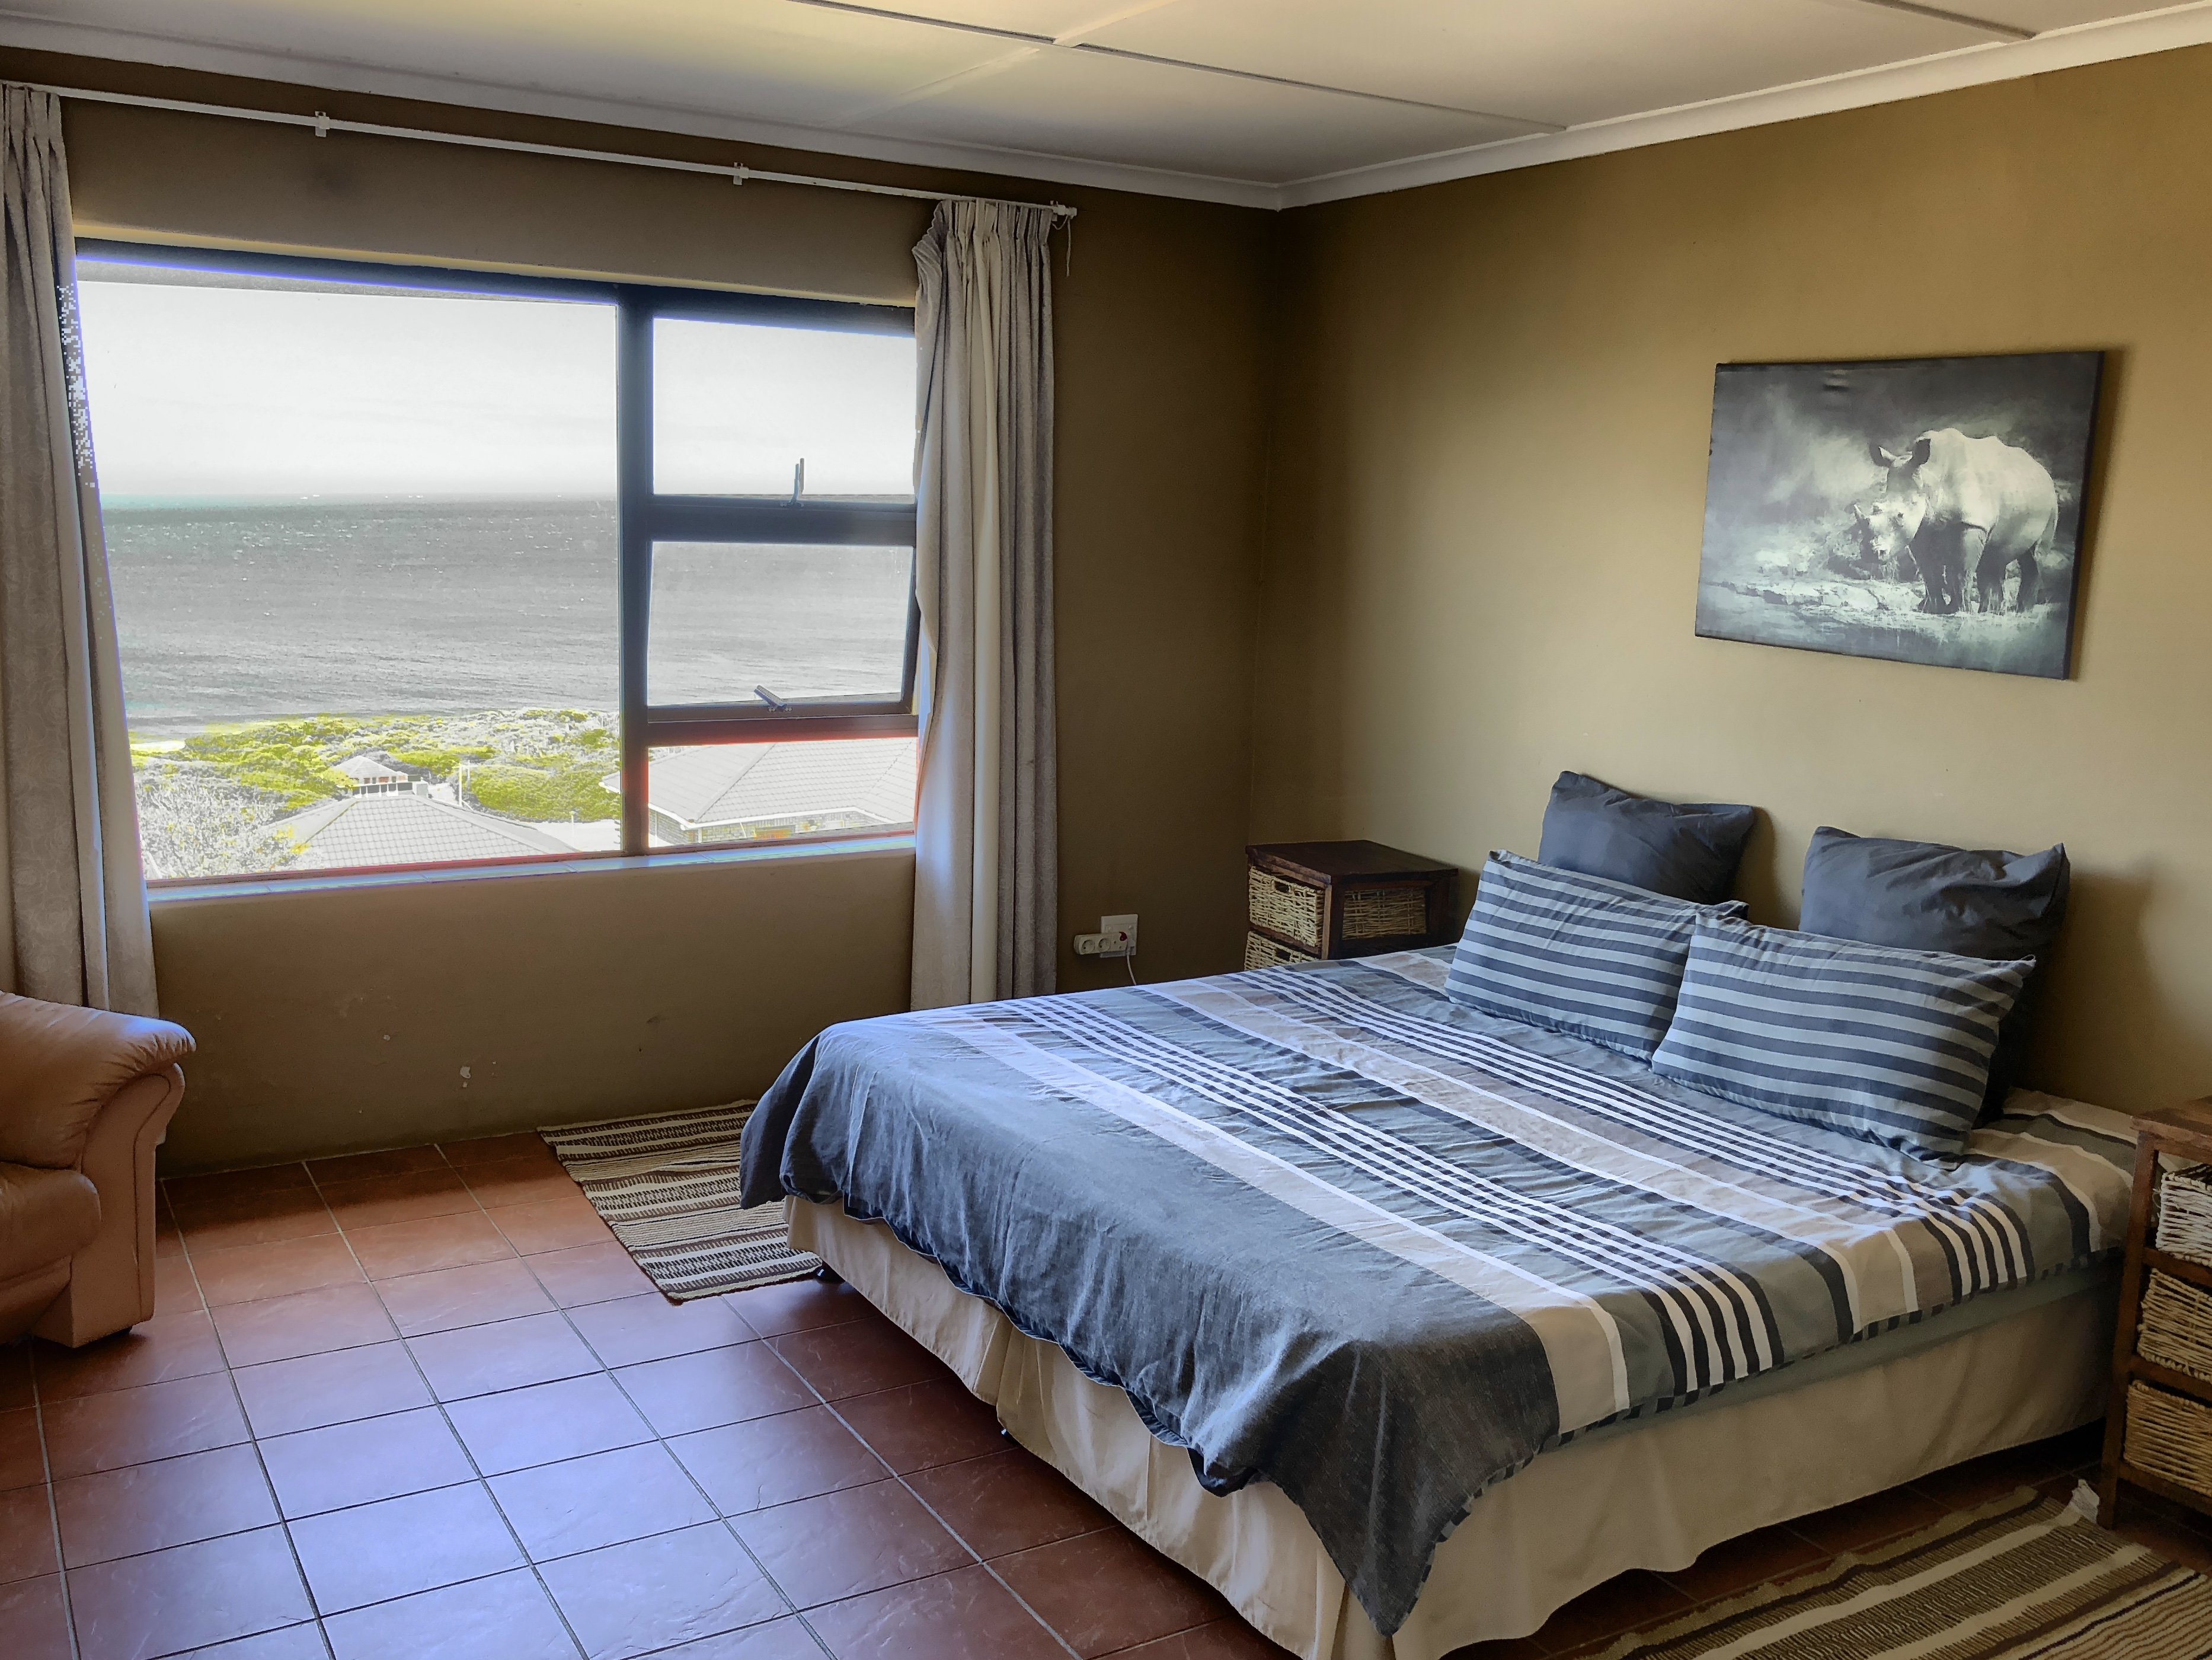 Blick in das Schlafzimmer im Starfishsurfhouse, Jeffreys Bay, Südafrika